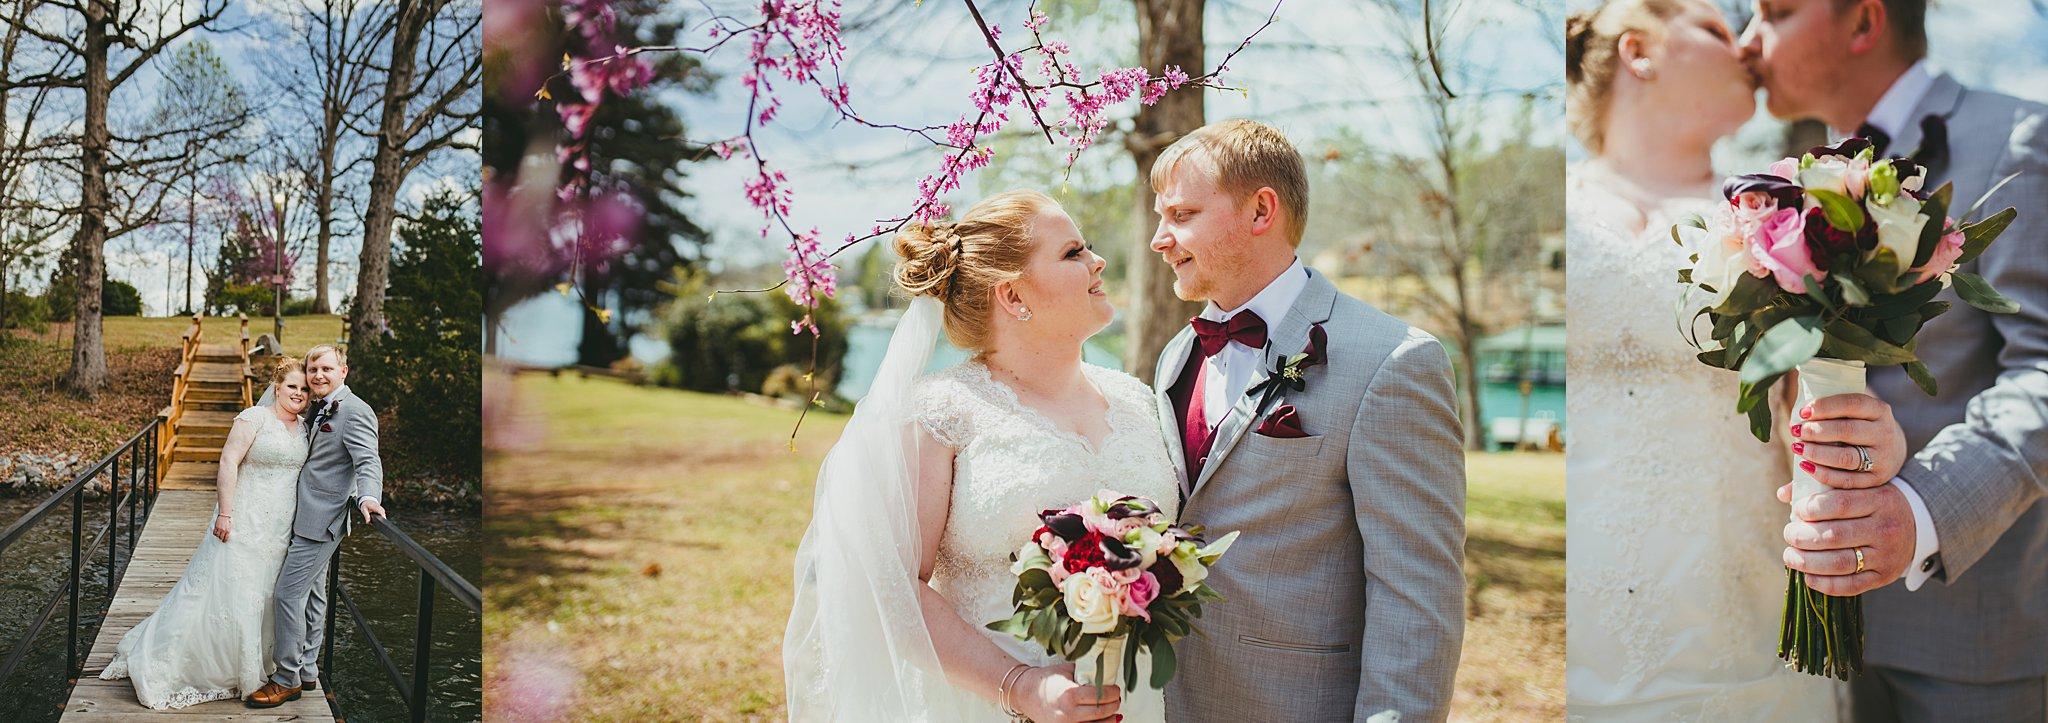 AtlantaWeddingPhotographers Carolina Destination Wedding